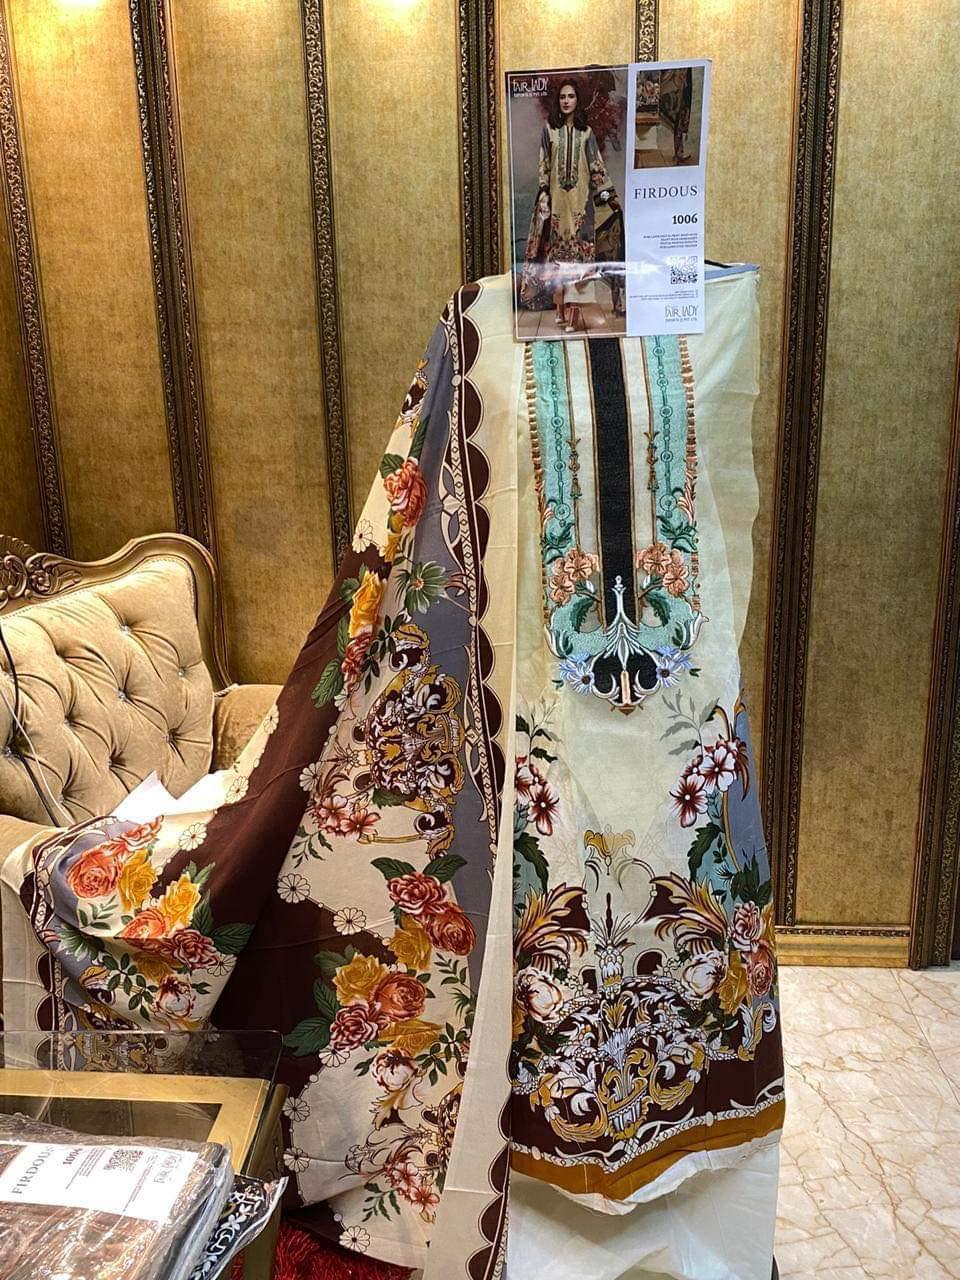 Fair Lady Firdous Designer Lawn And Nazneez Dupatta Suits In Best Wholesale Rate